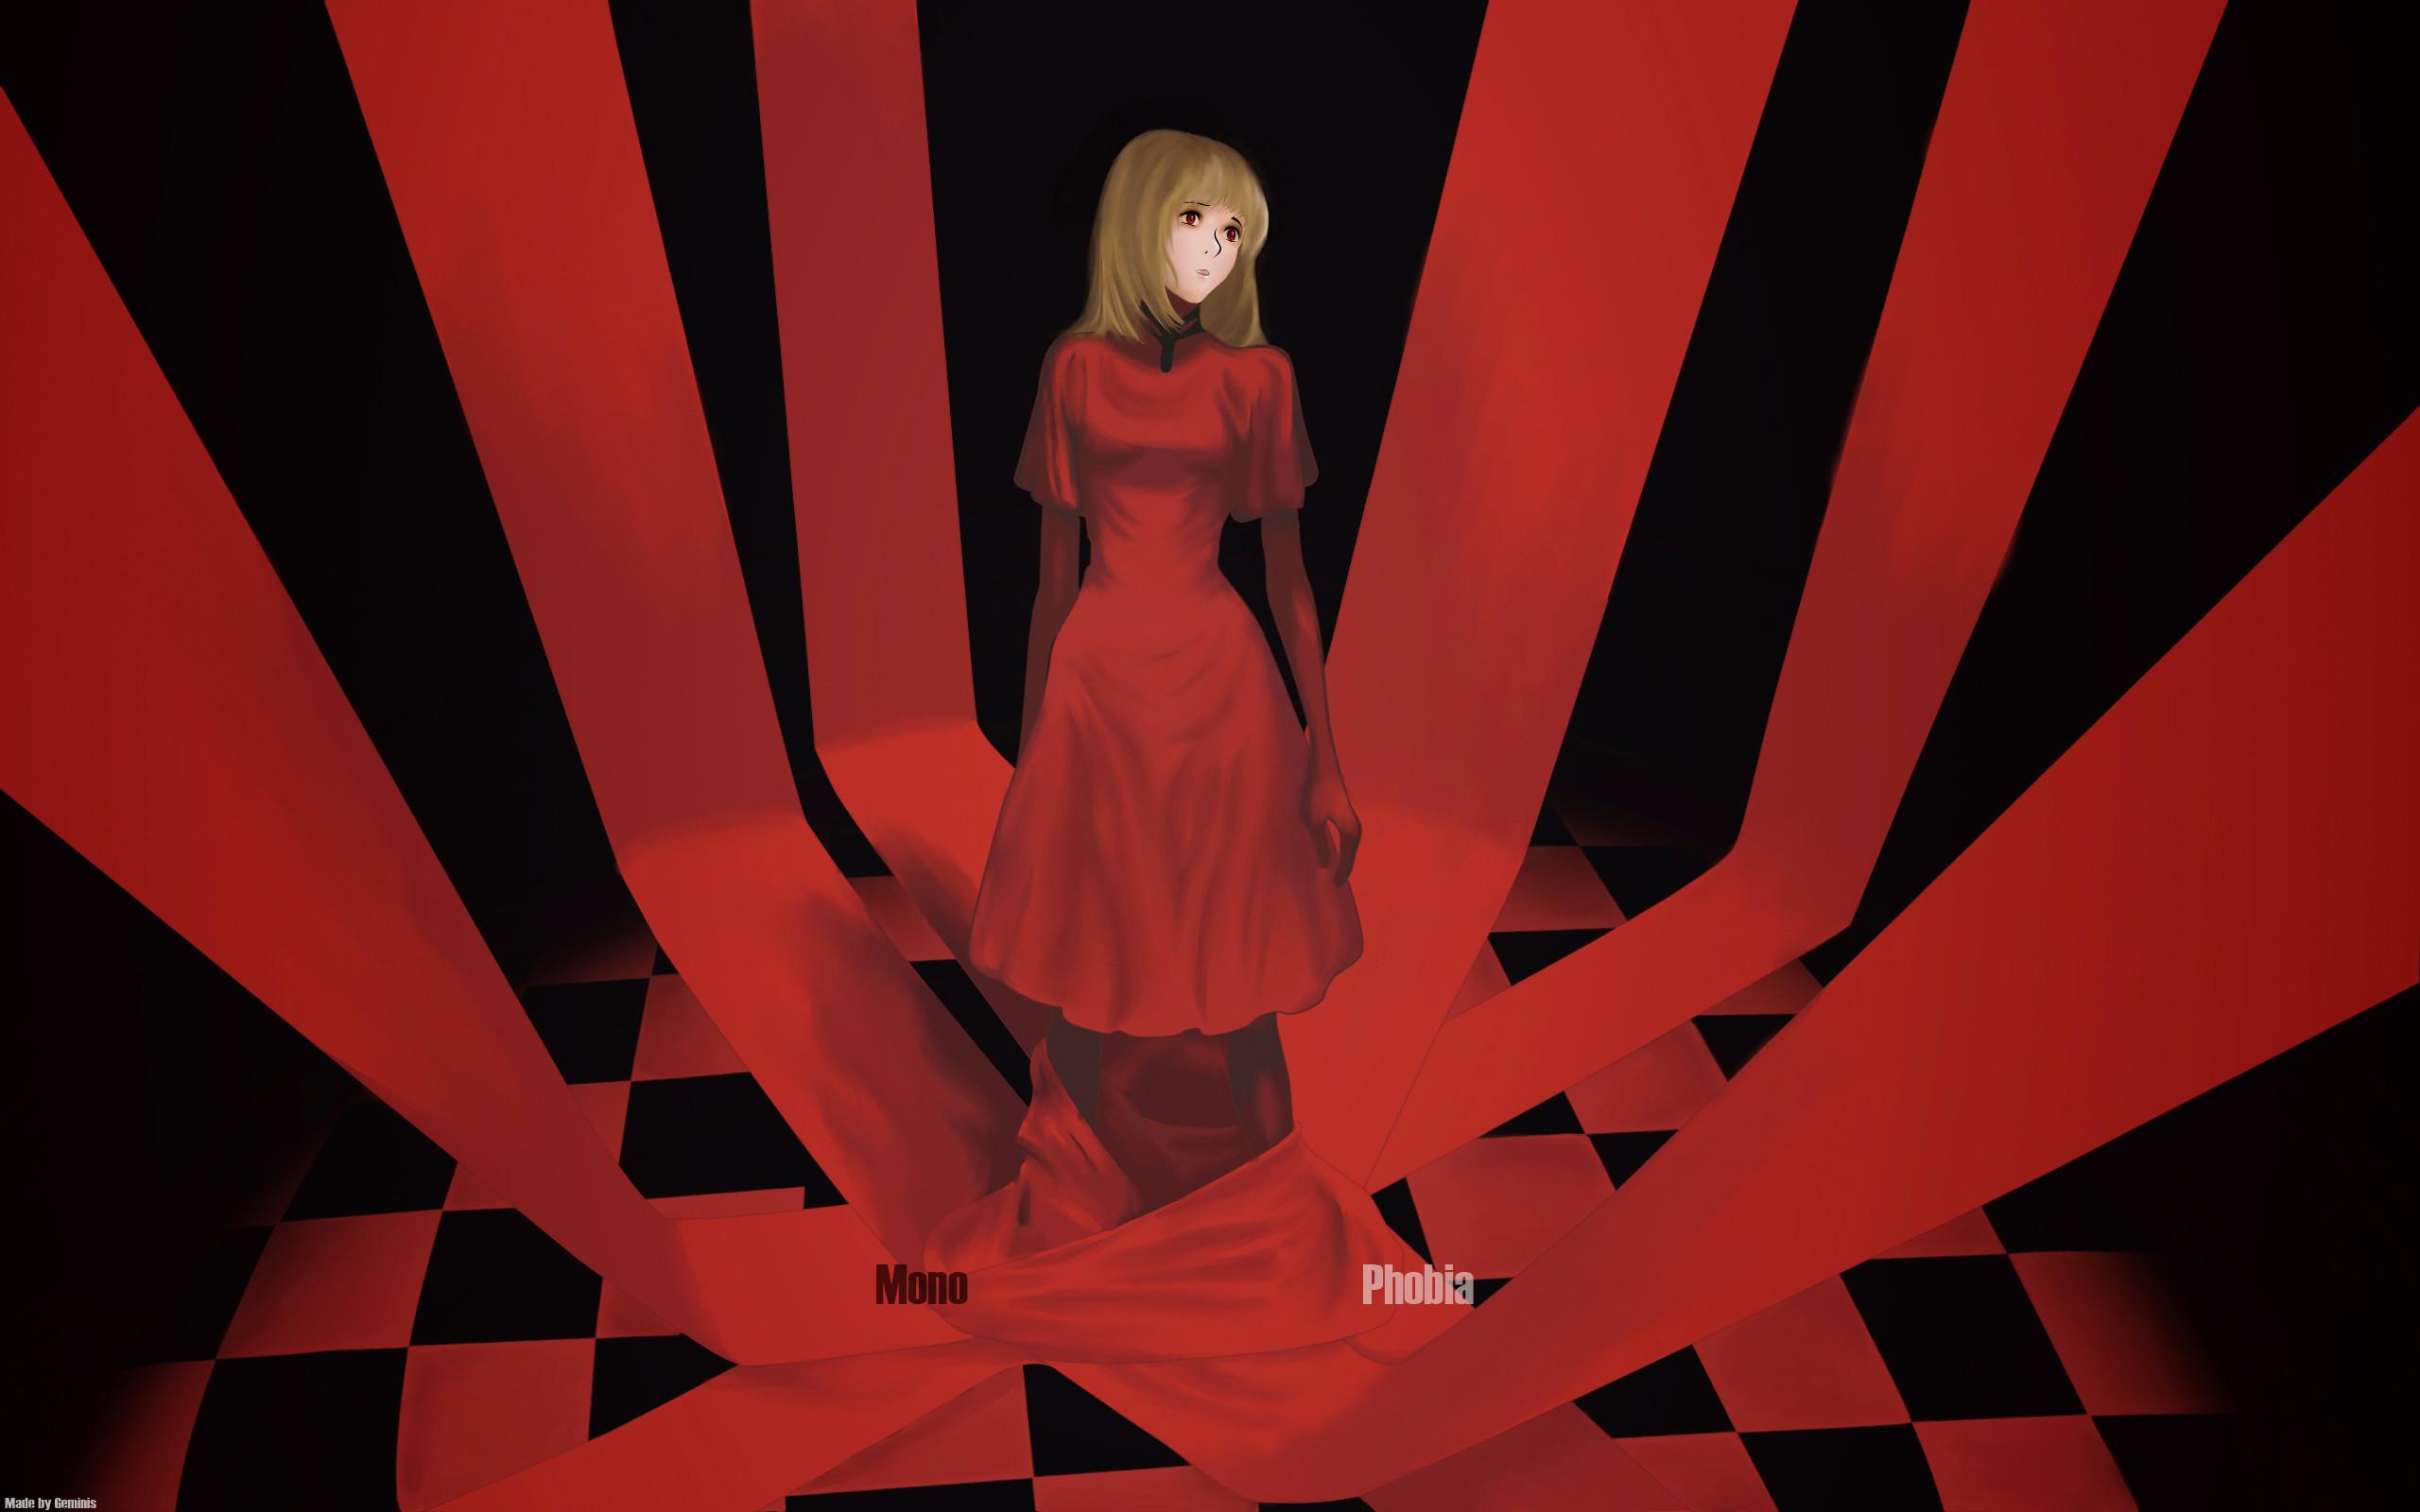 580 other anime red wallpaper, Wallpaper, Desktop Background .